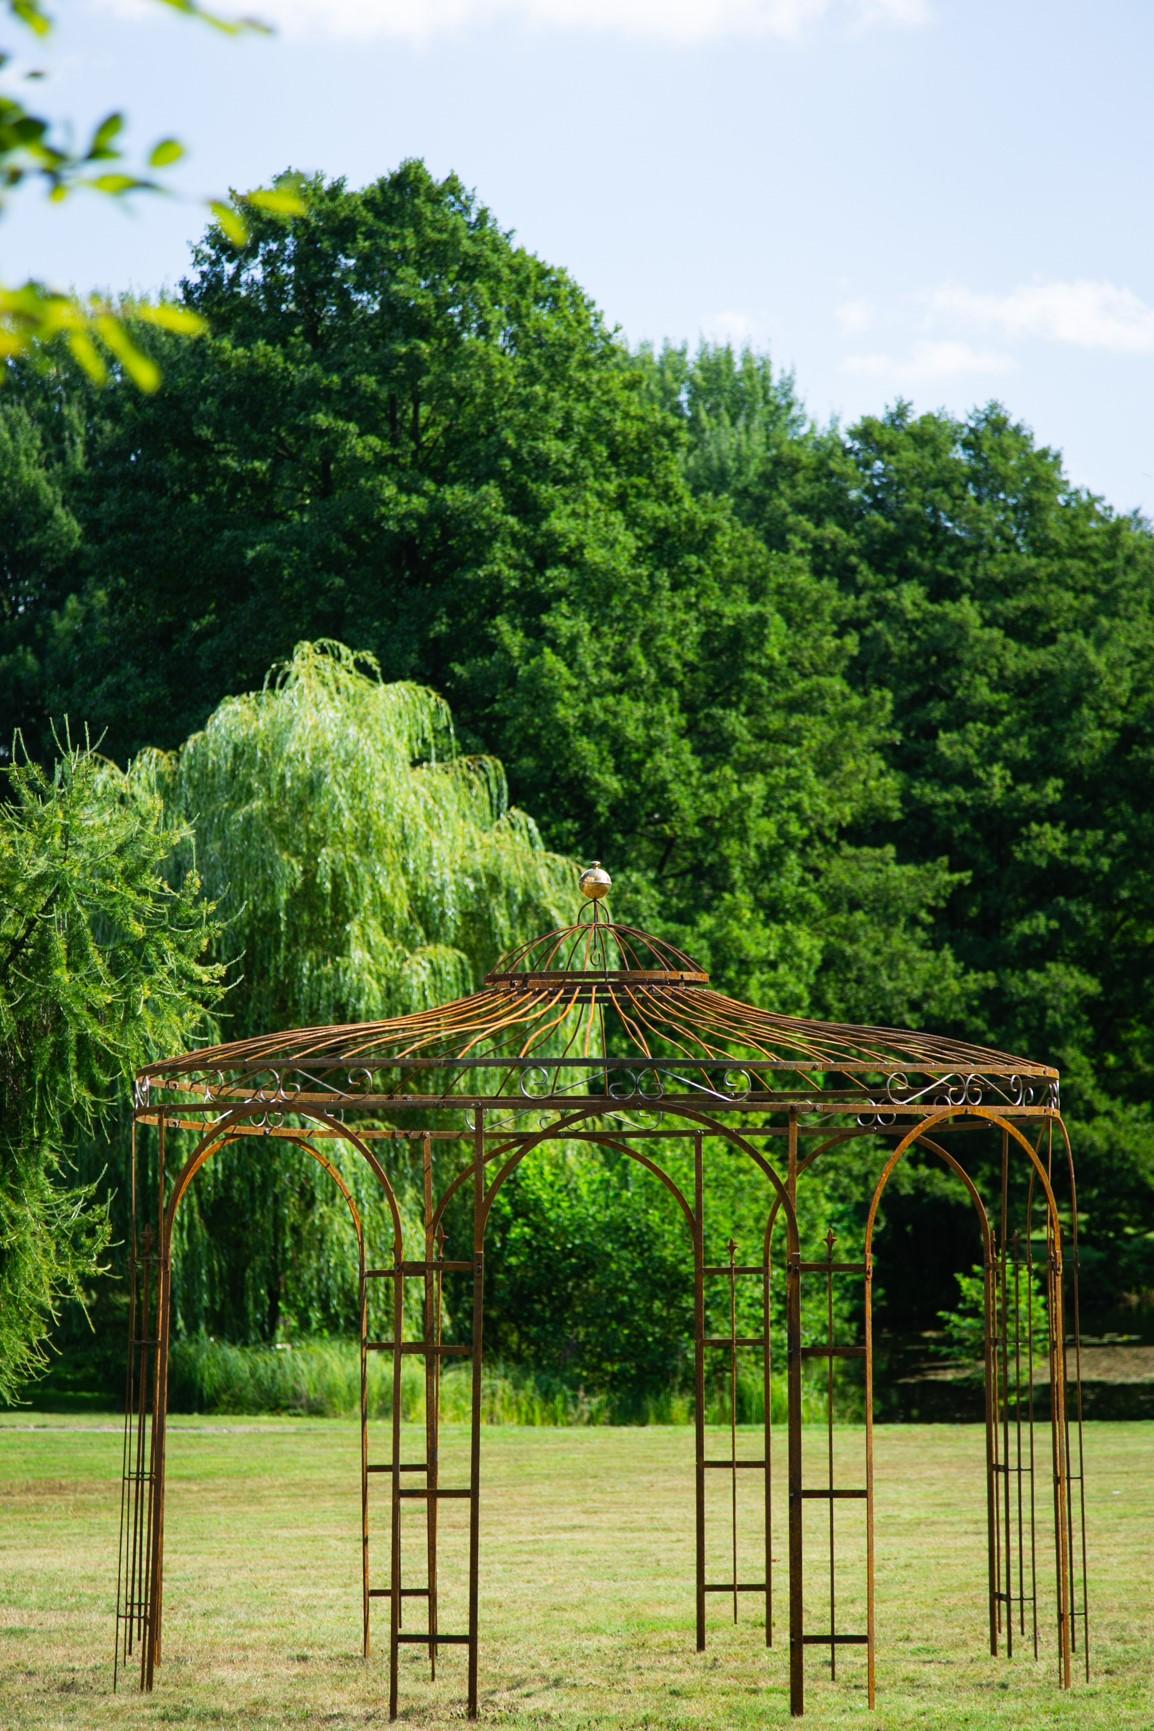 Full Size of Pavillon Eisen Gartenpavillon Metall Rost 250cm Eleganz Garten Wohnzimmer Pavillon Eisen